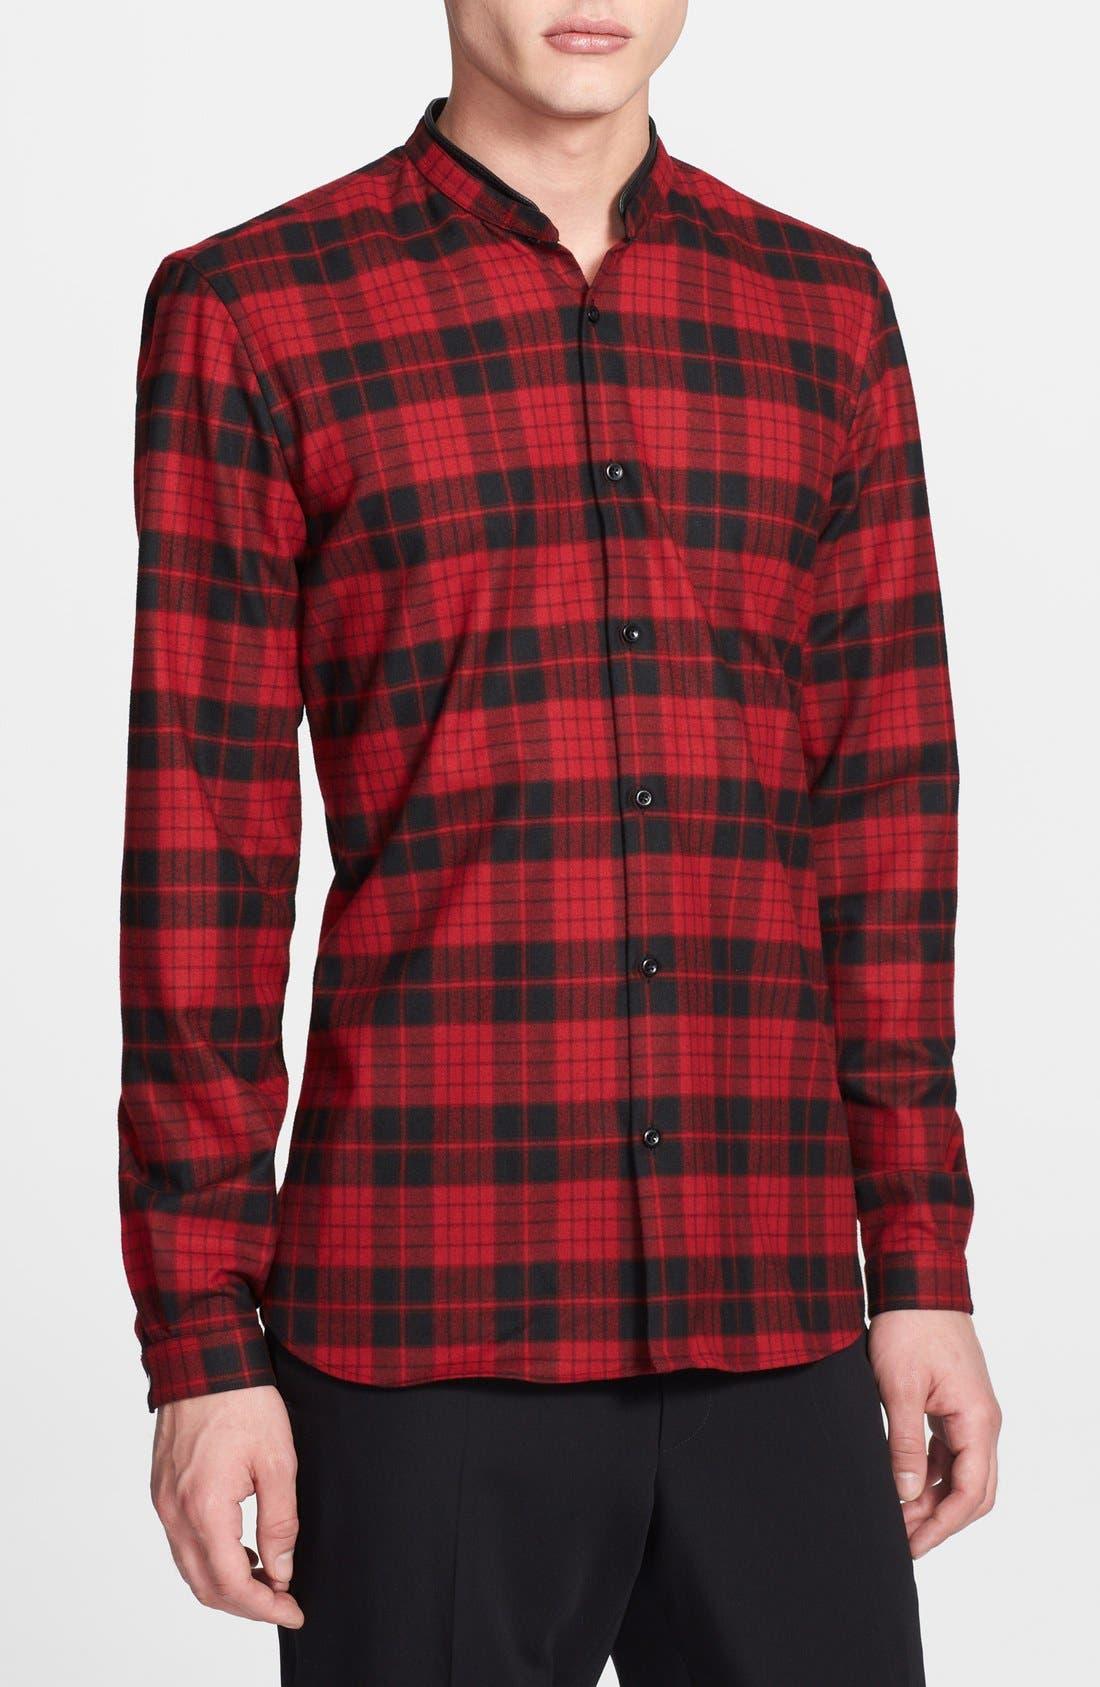 Main Image - The Kooples Band Collar Plaid Flannel Shirt